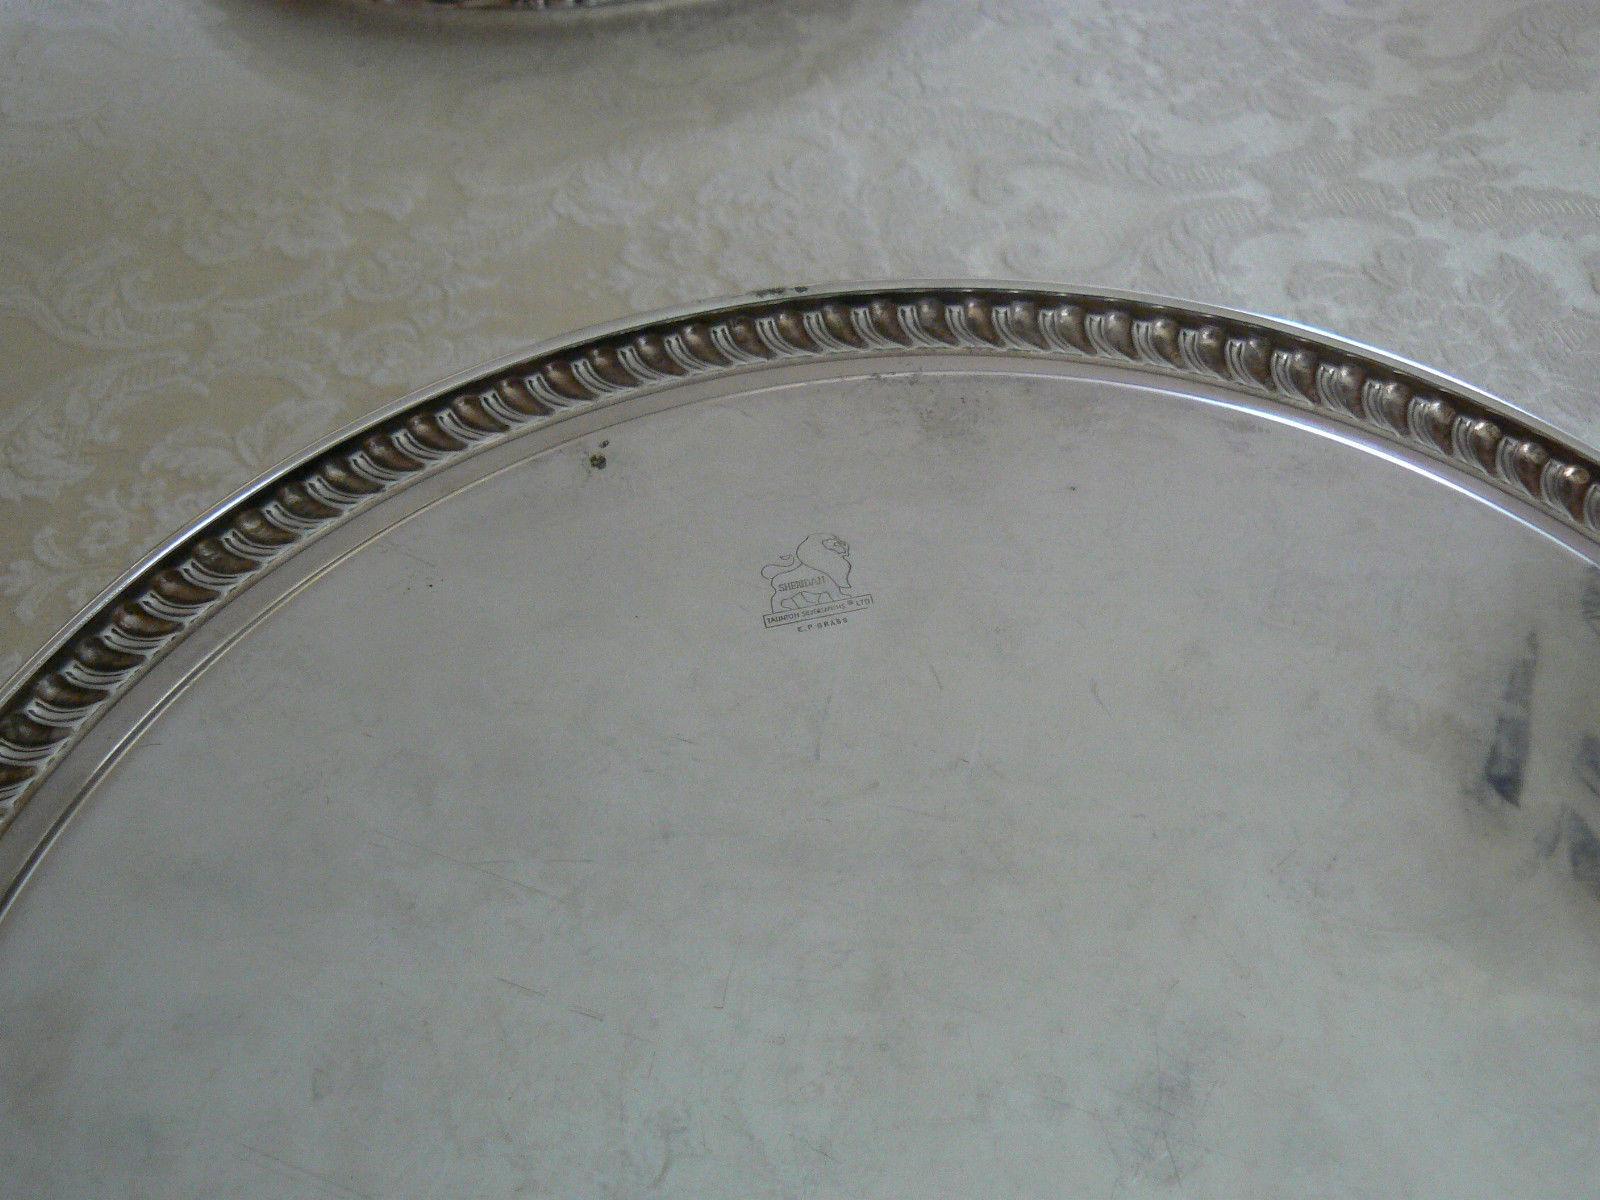 Vintage Estate Find Sheridan Silverplate Taunton Silversmiths LTD Serving Tray